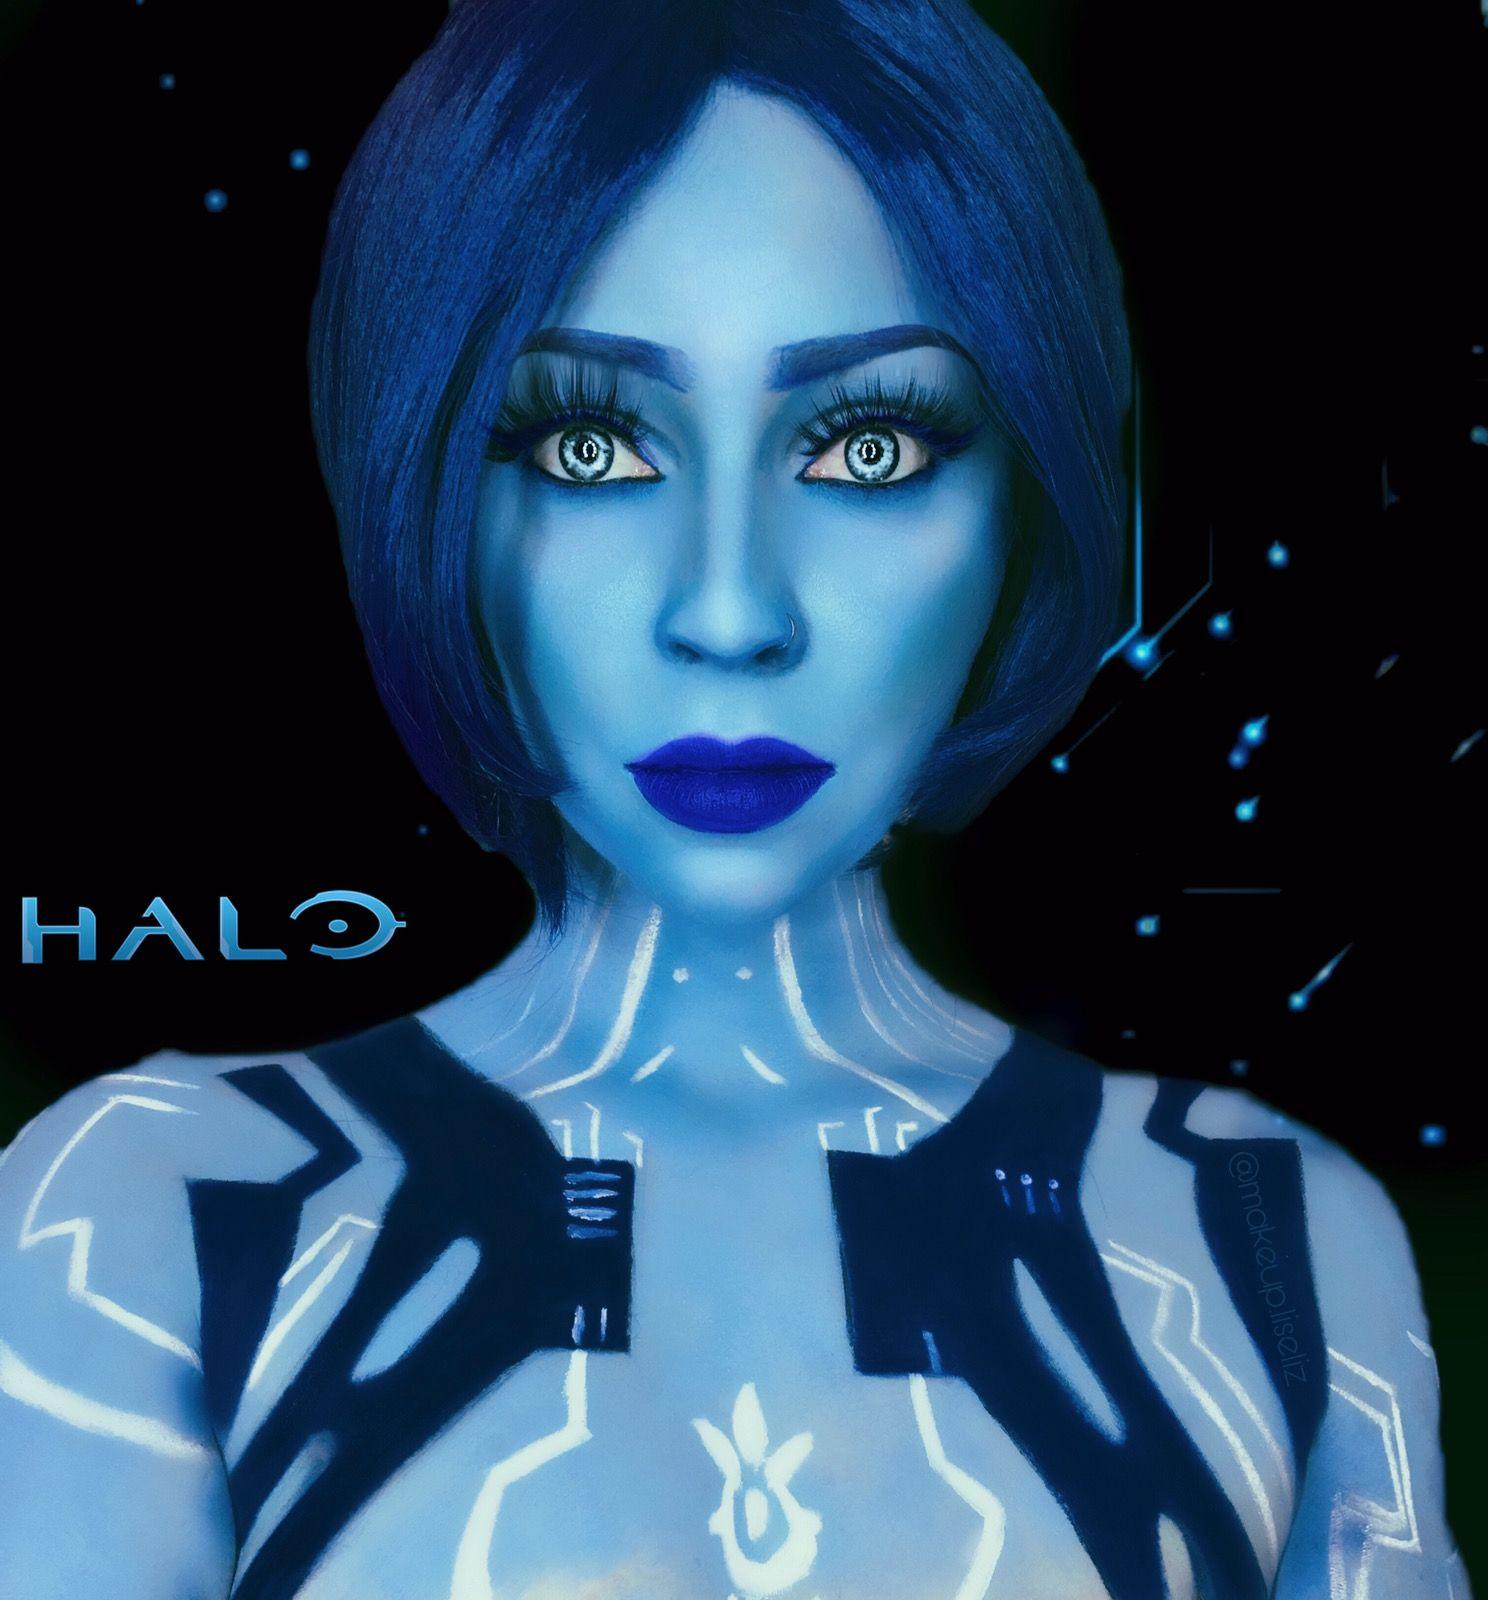 Halo - Cortana 19 by Hyokenseisou-Cosplay on deviantART